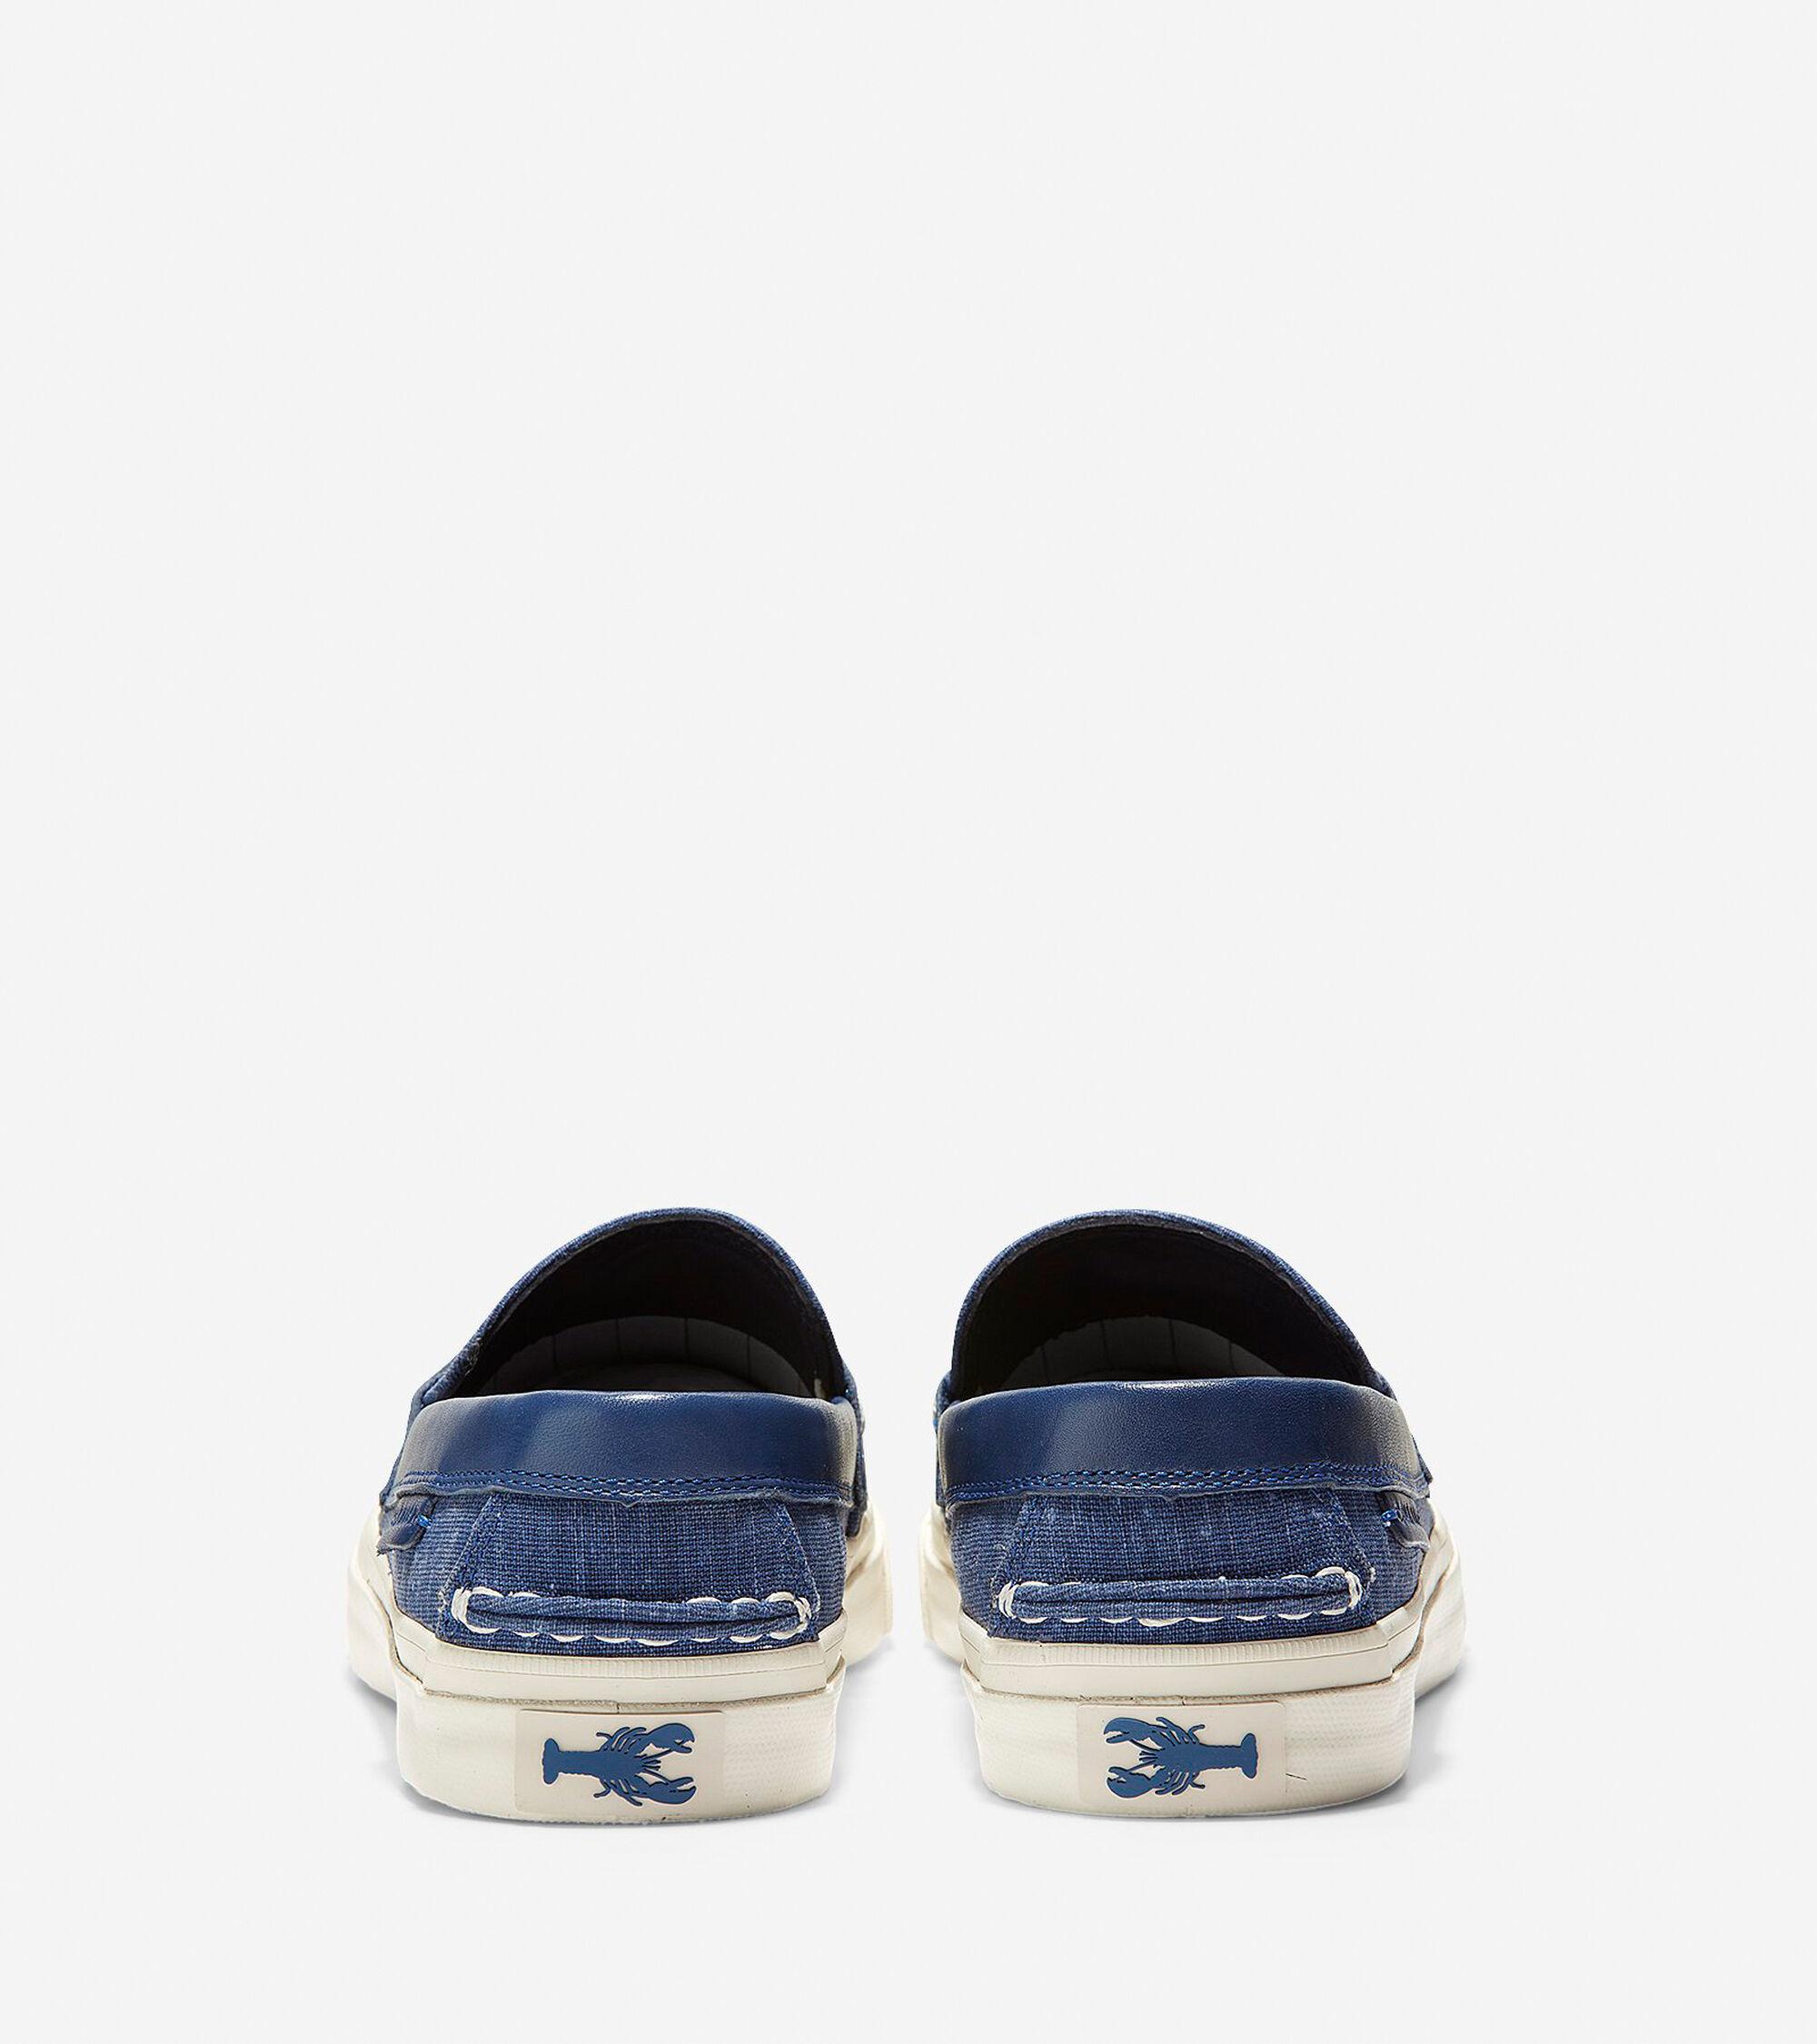 875549cd8fc Men s Pinch Weekender LX Loafers in Navy Peony